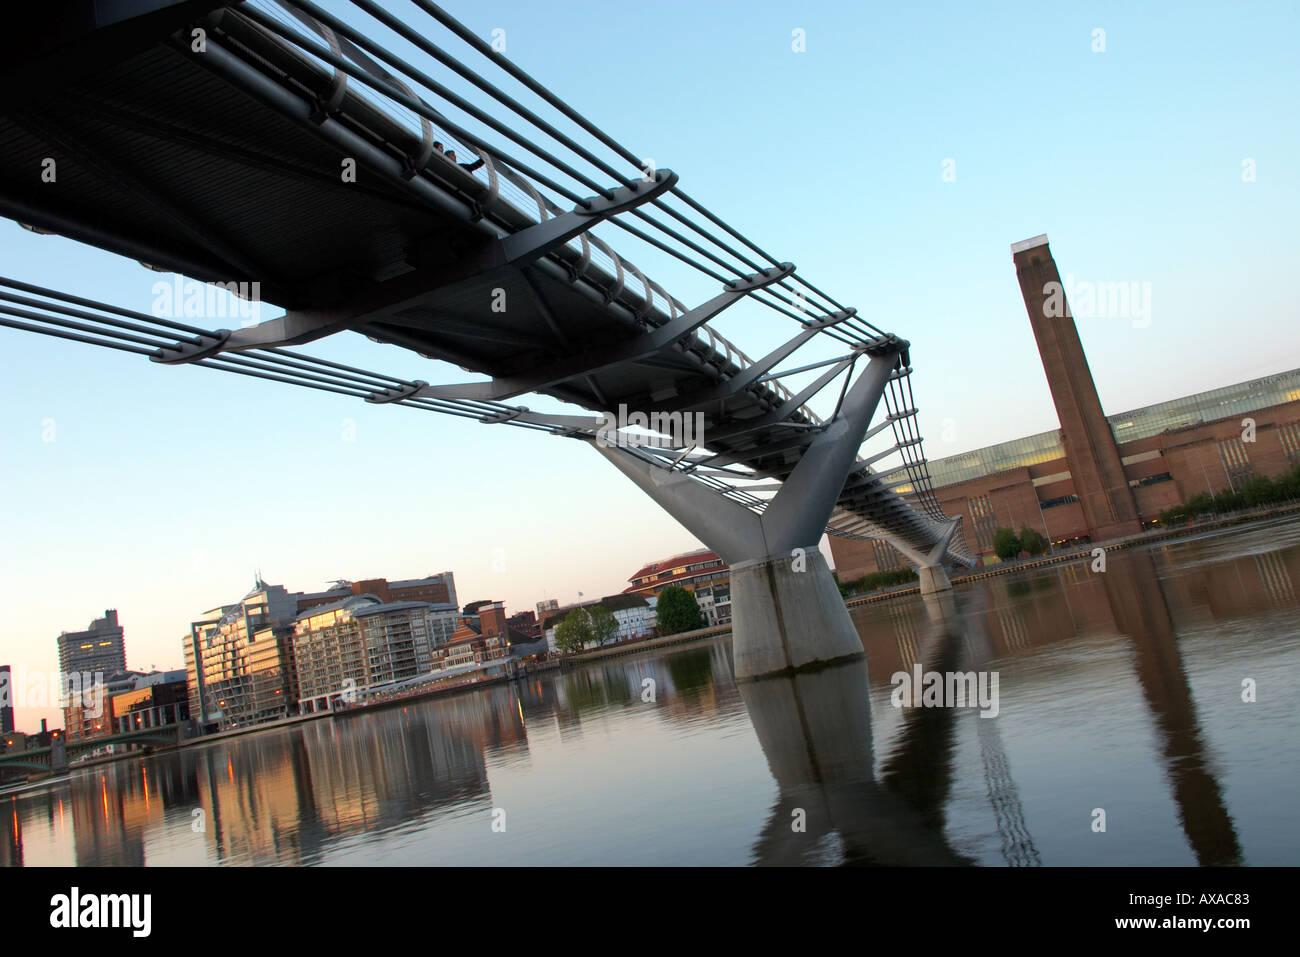 The St Pauls Millennium Bridge in London England - Stock Image